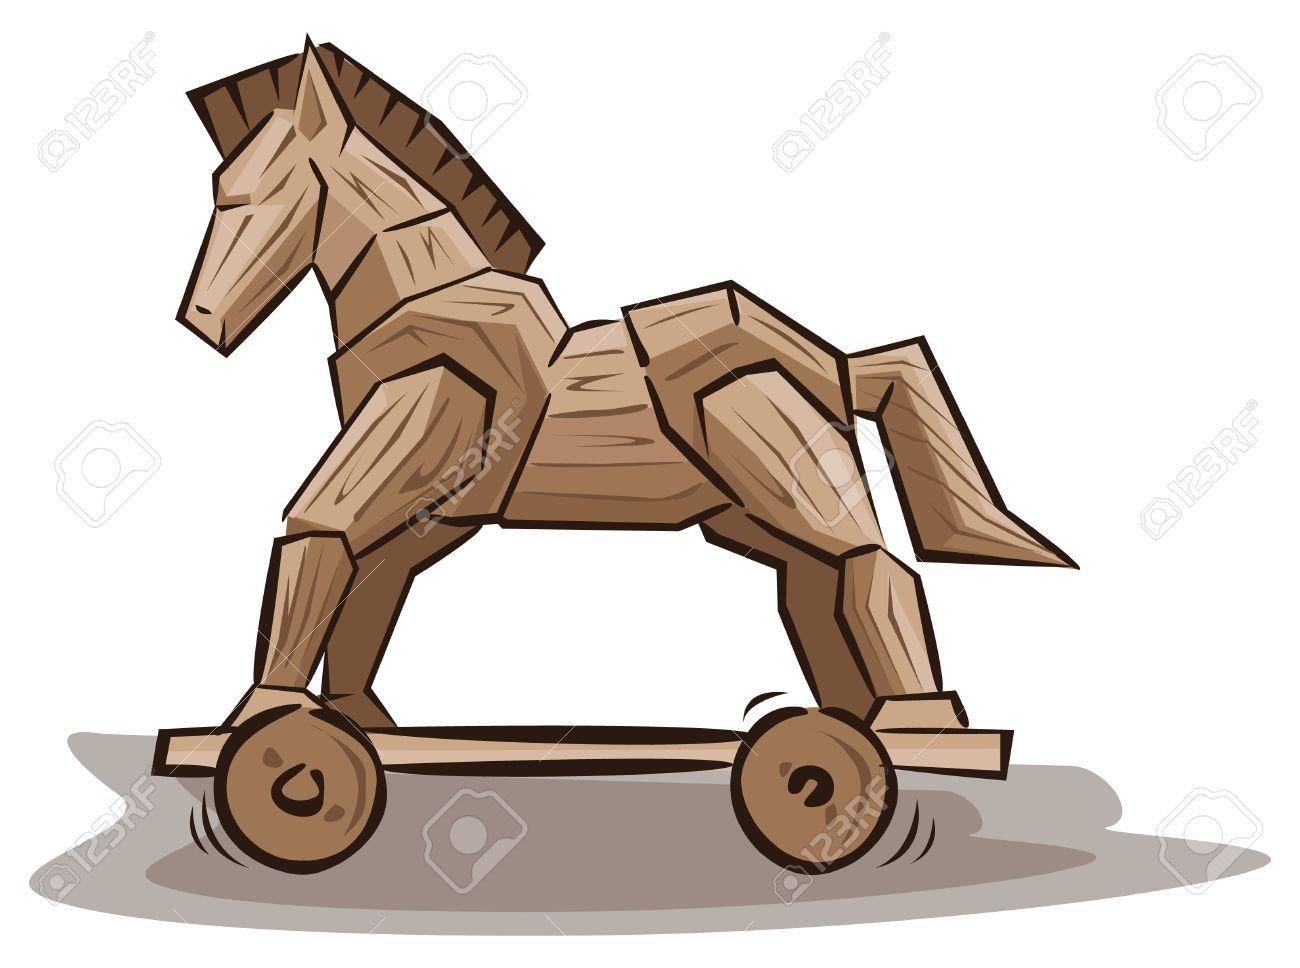 Trojan horse toys.